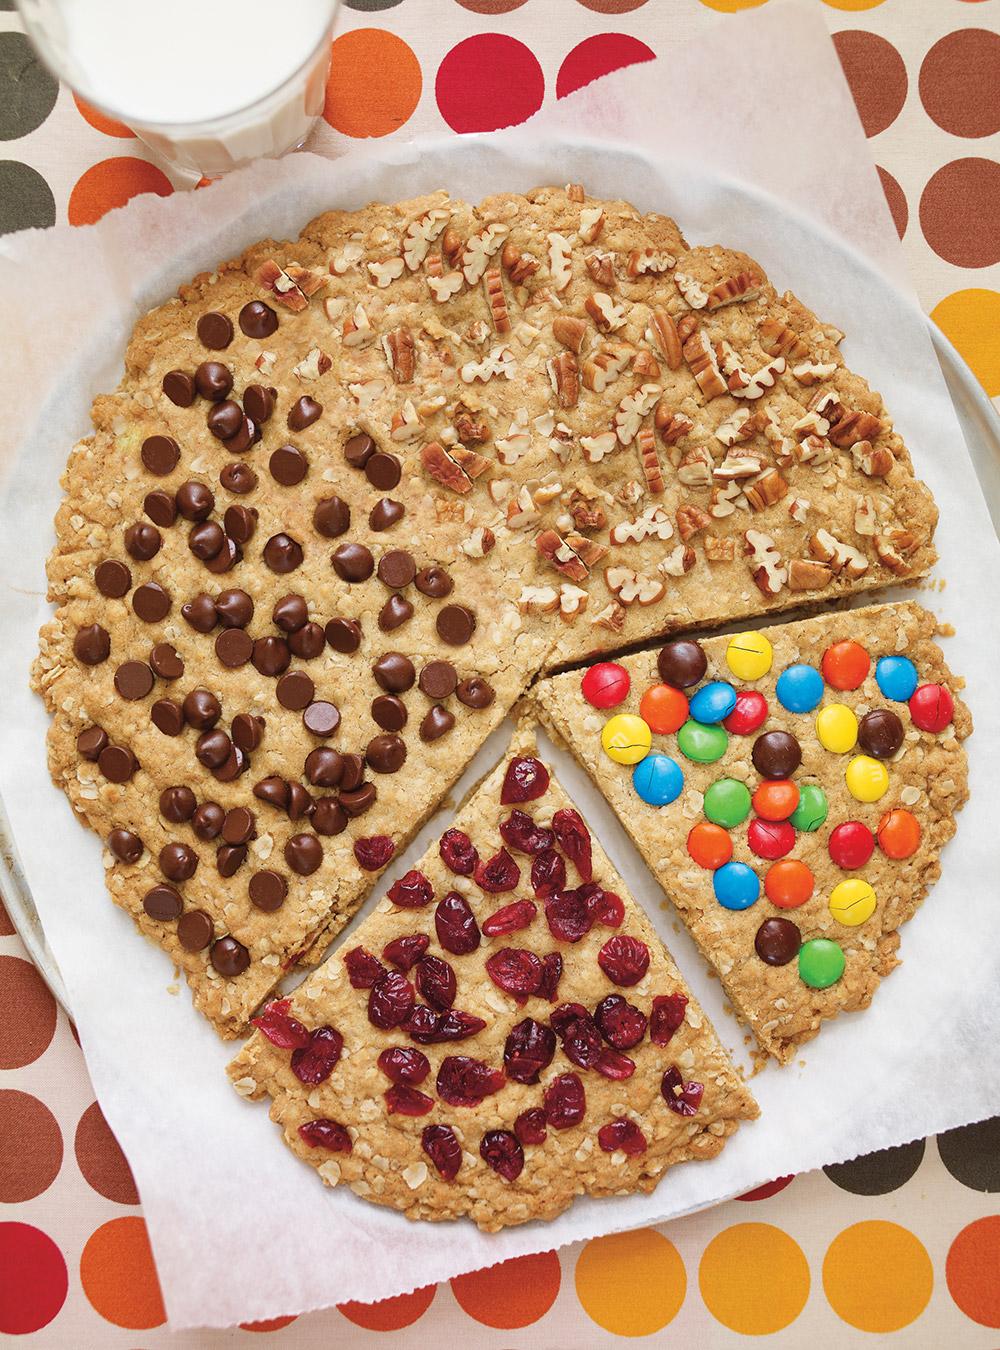 Biscuit géant tout garni | ricardo